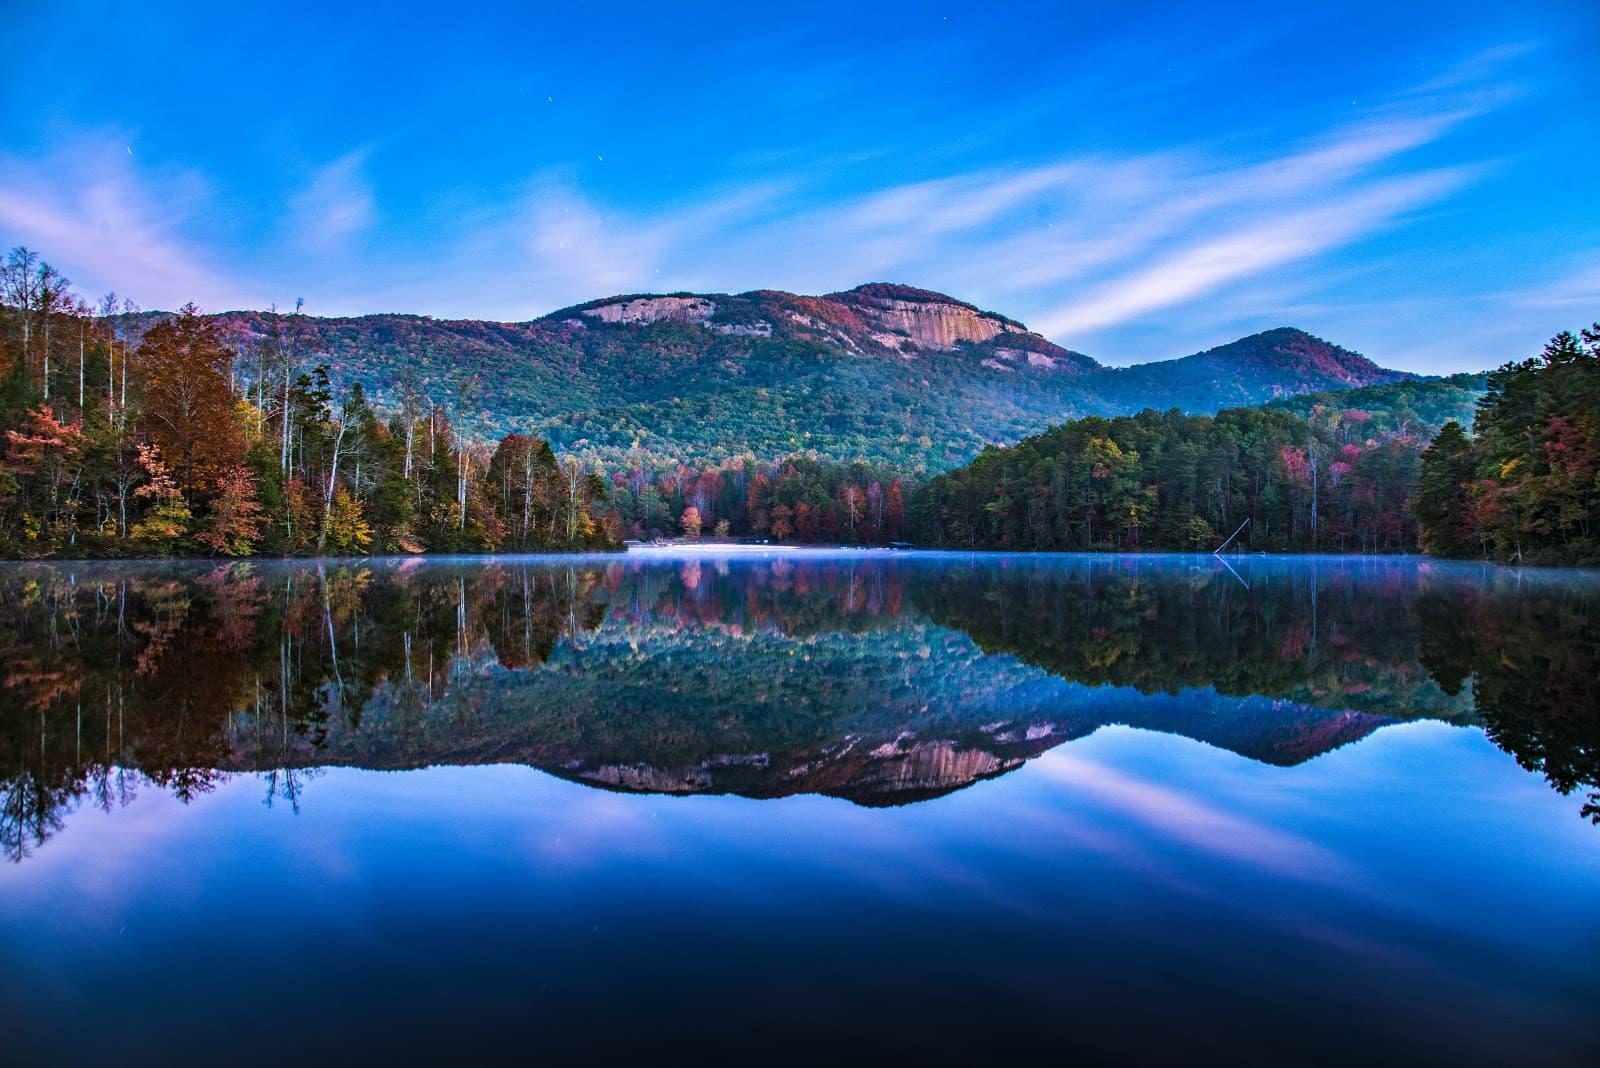 Poinsett State Park Lake SUP